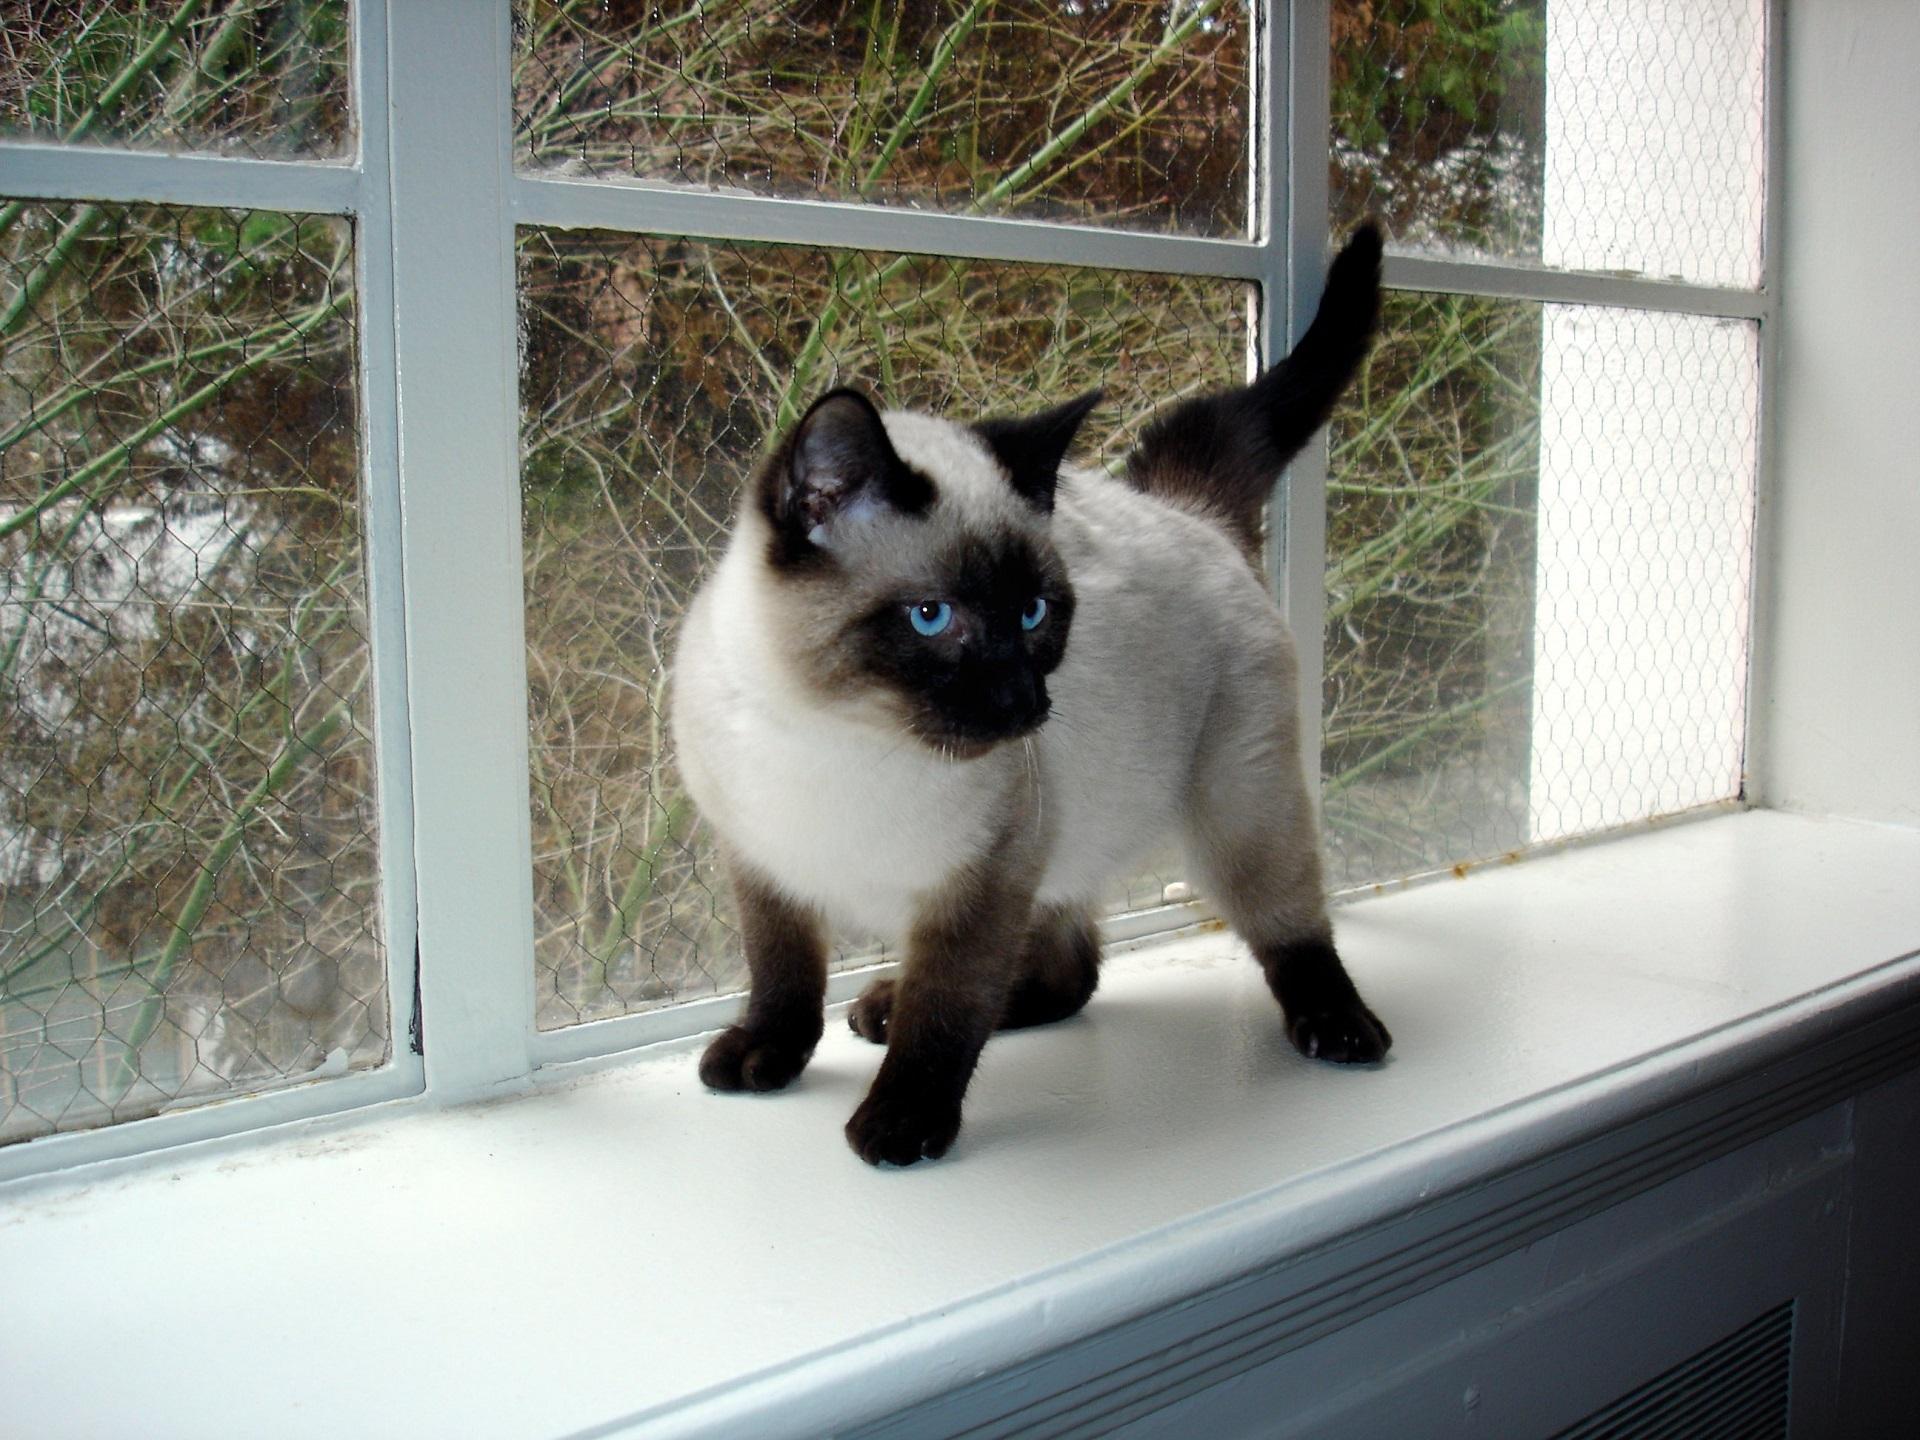 Free Images : hair, window, animal, looking, pet, fur